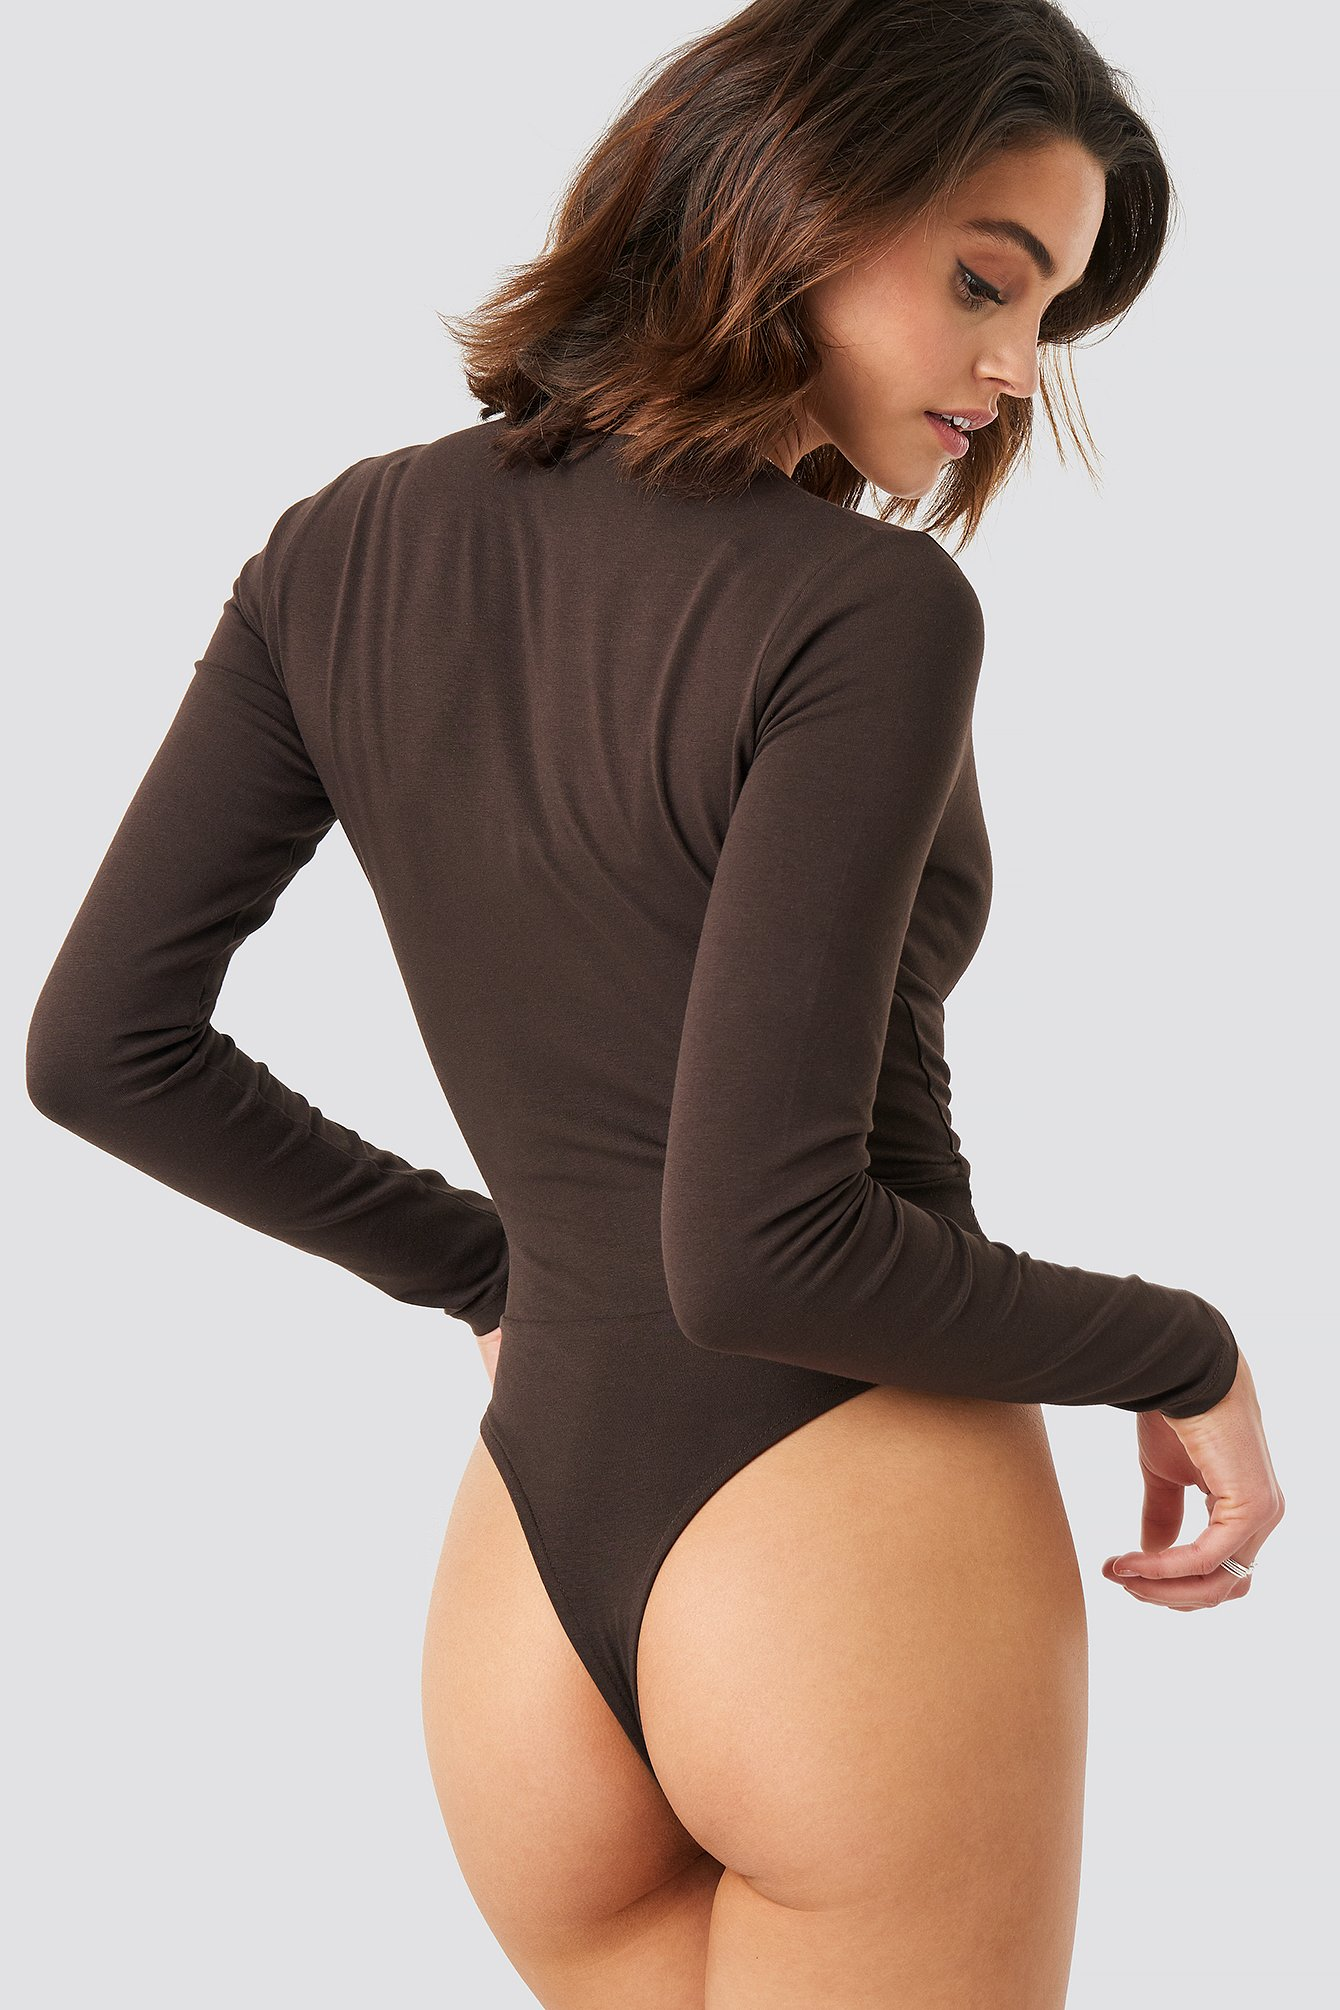 Overlap Long Sleeve Body NA-KD.COM